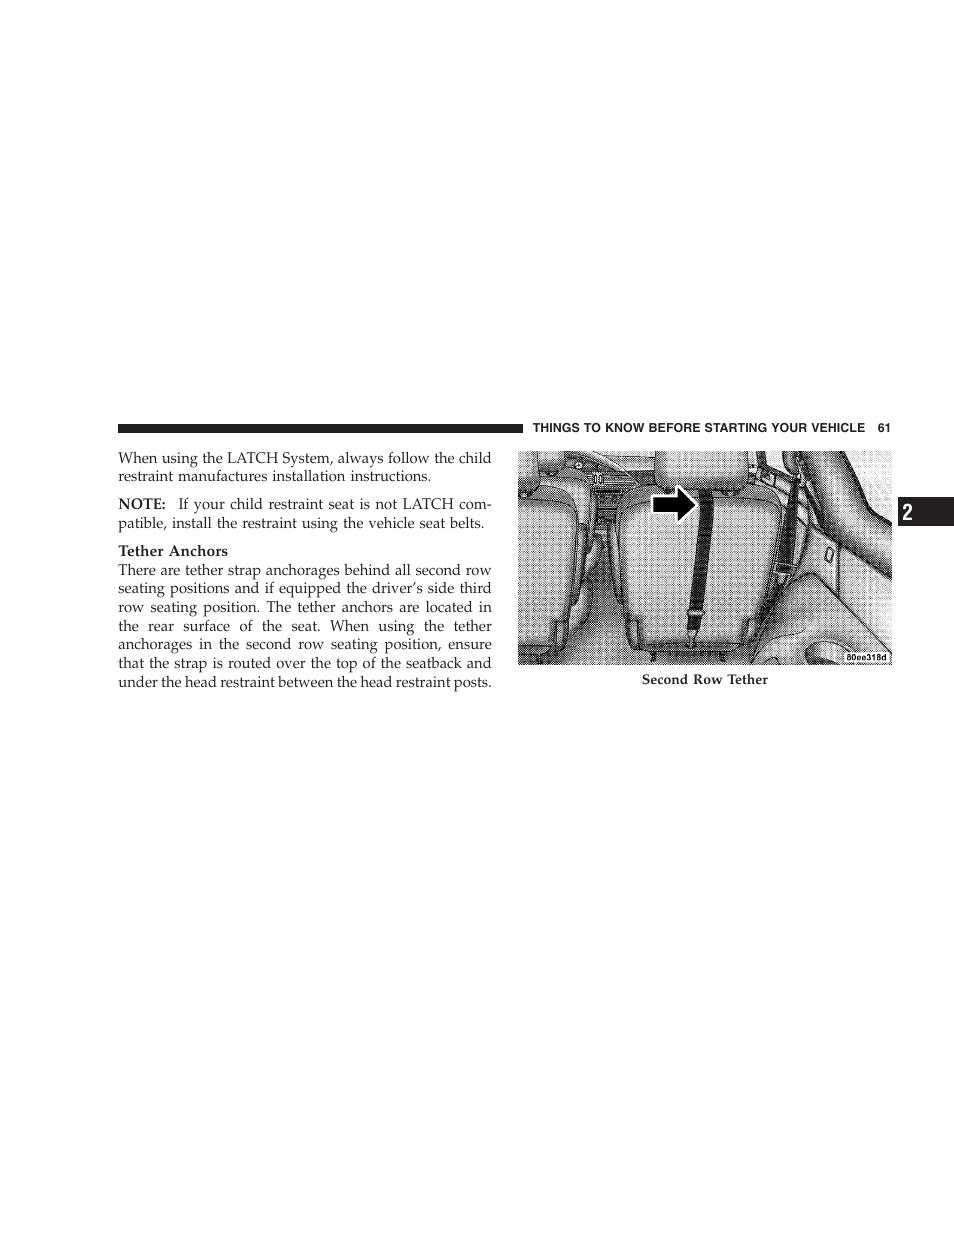 Chrysler user manuals chrysler 300 array chrysler 2017 pacifica user manual pdf download 9012108 rh archeryinfo info fandeluxe Gallery